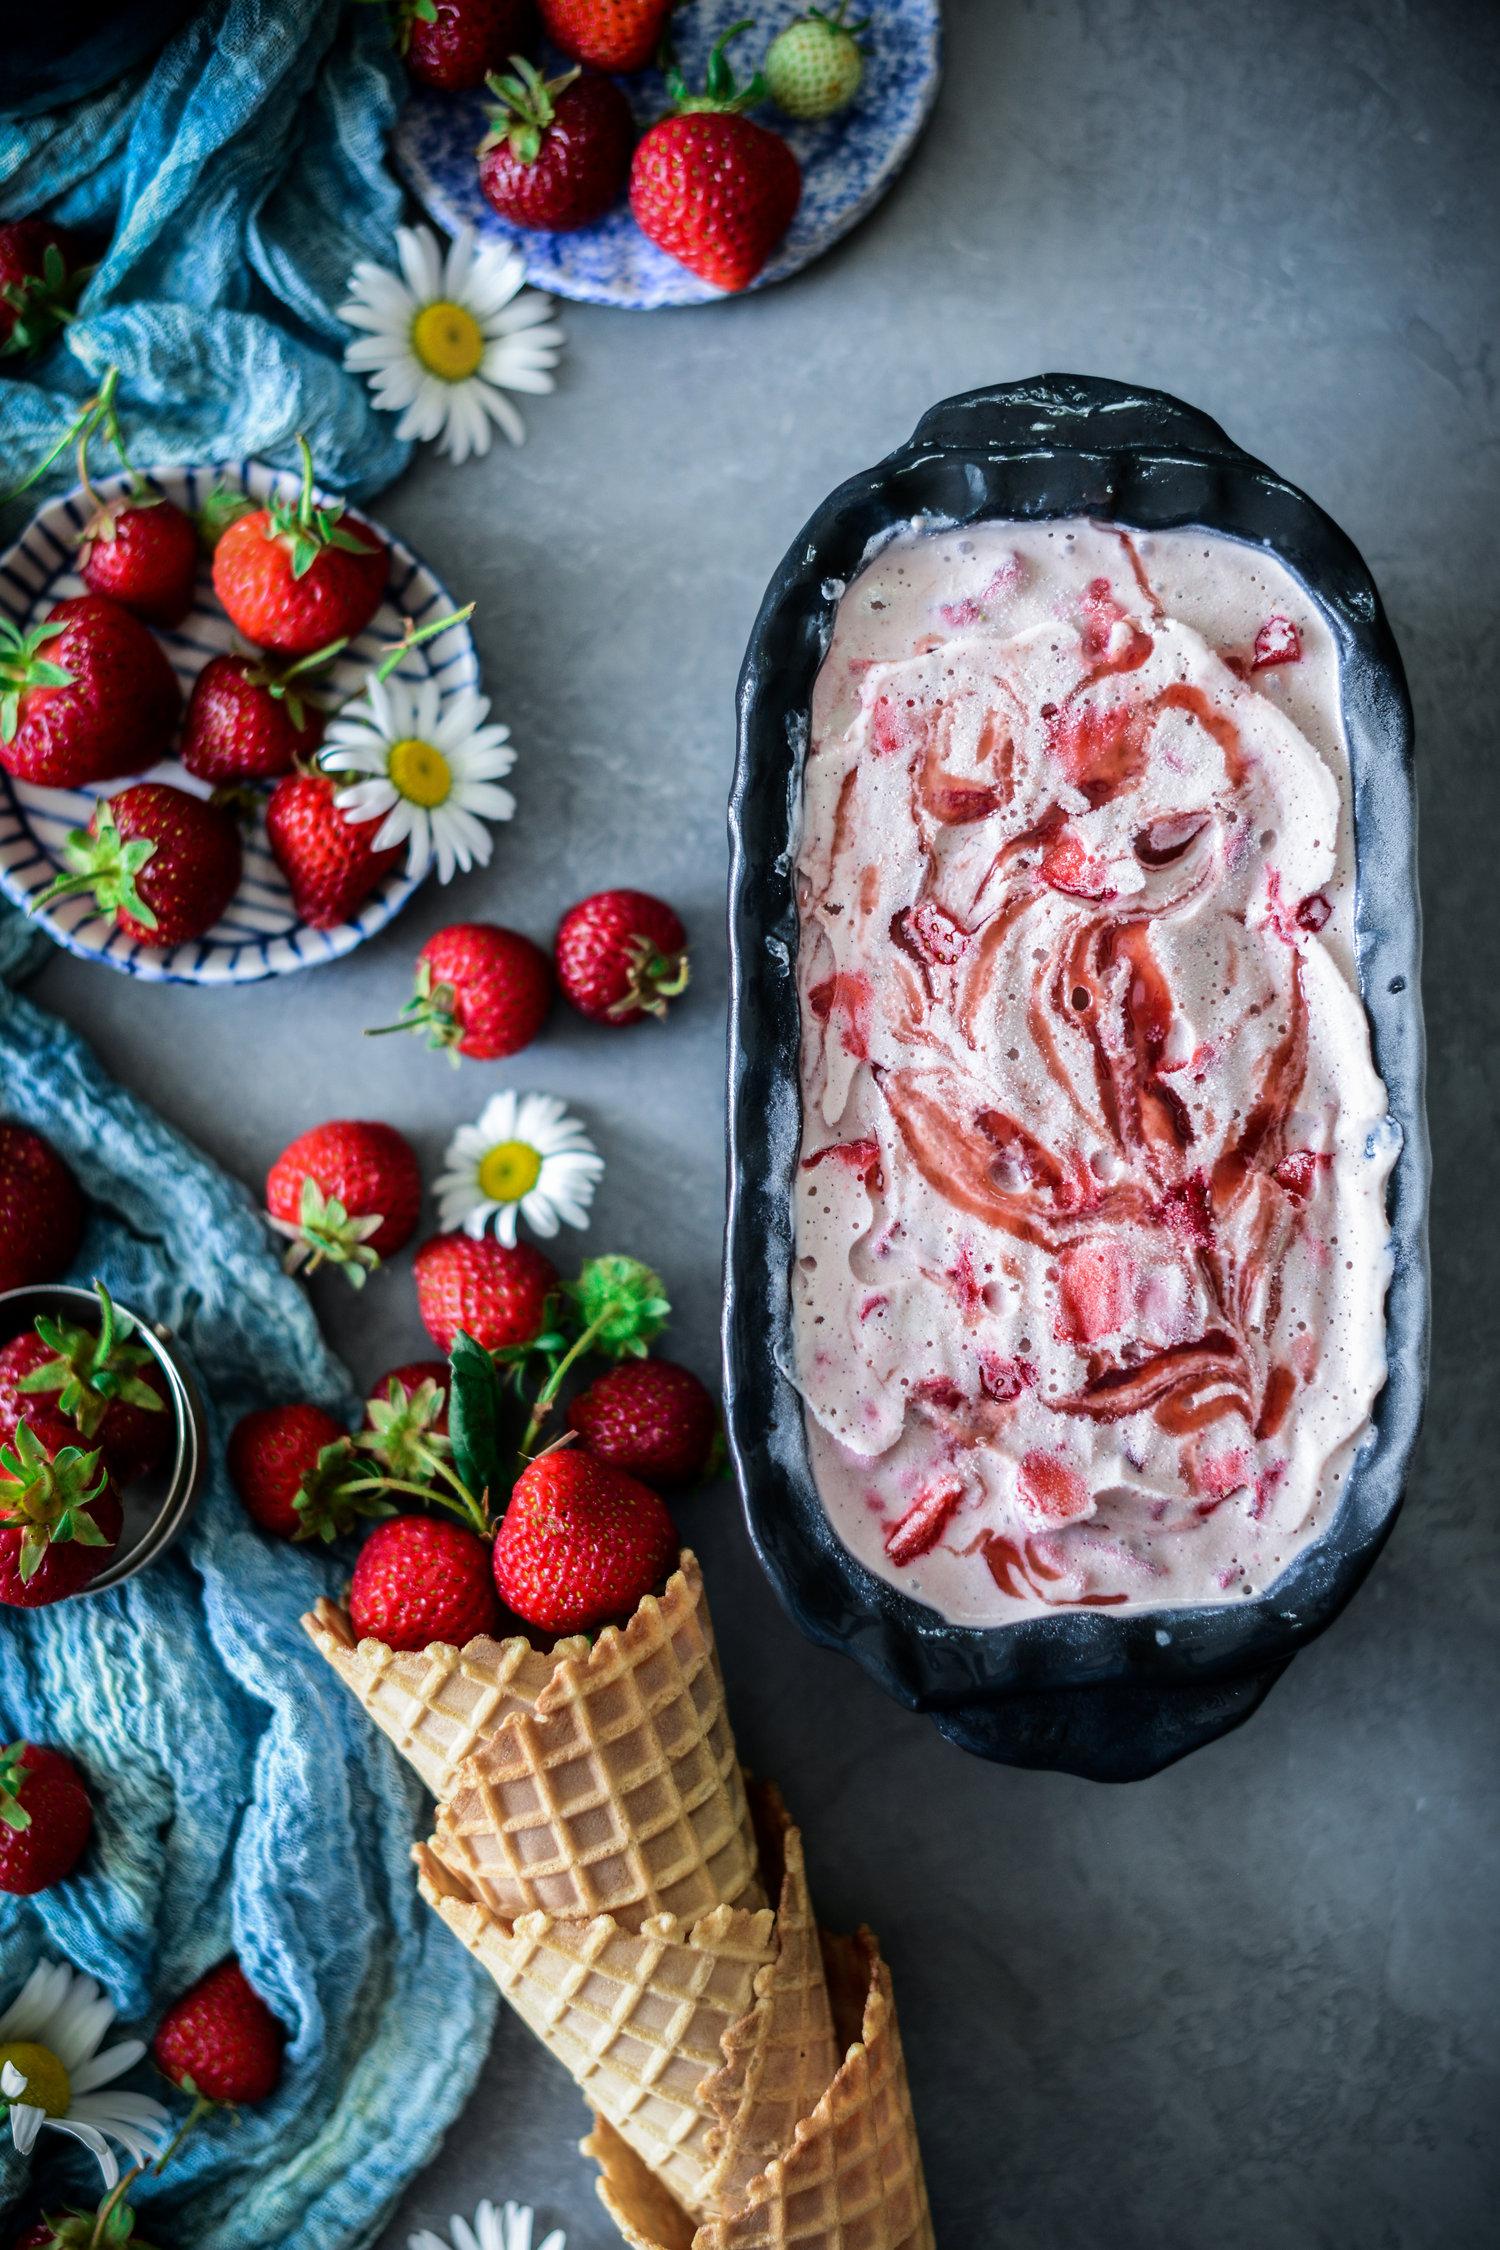 Fare Isle | Vegan Strawberry Coconut Milk Ice-Cream with Strawberry Jam Ripple